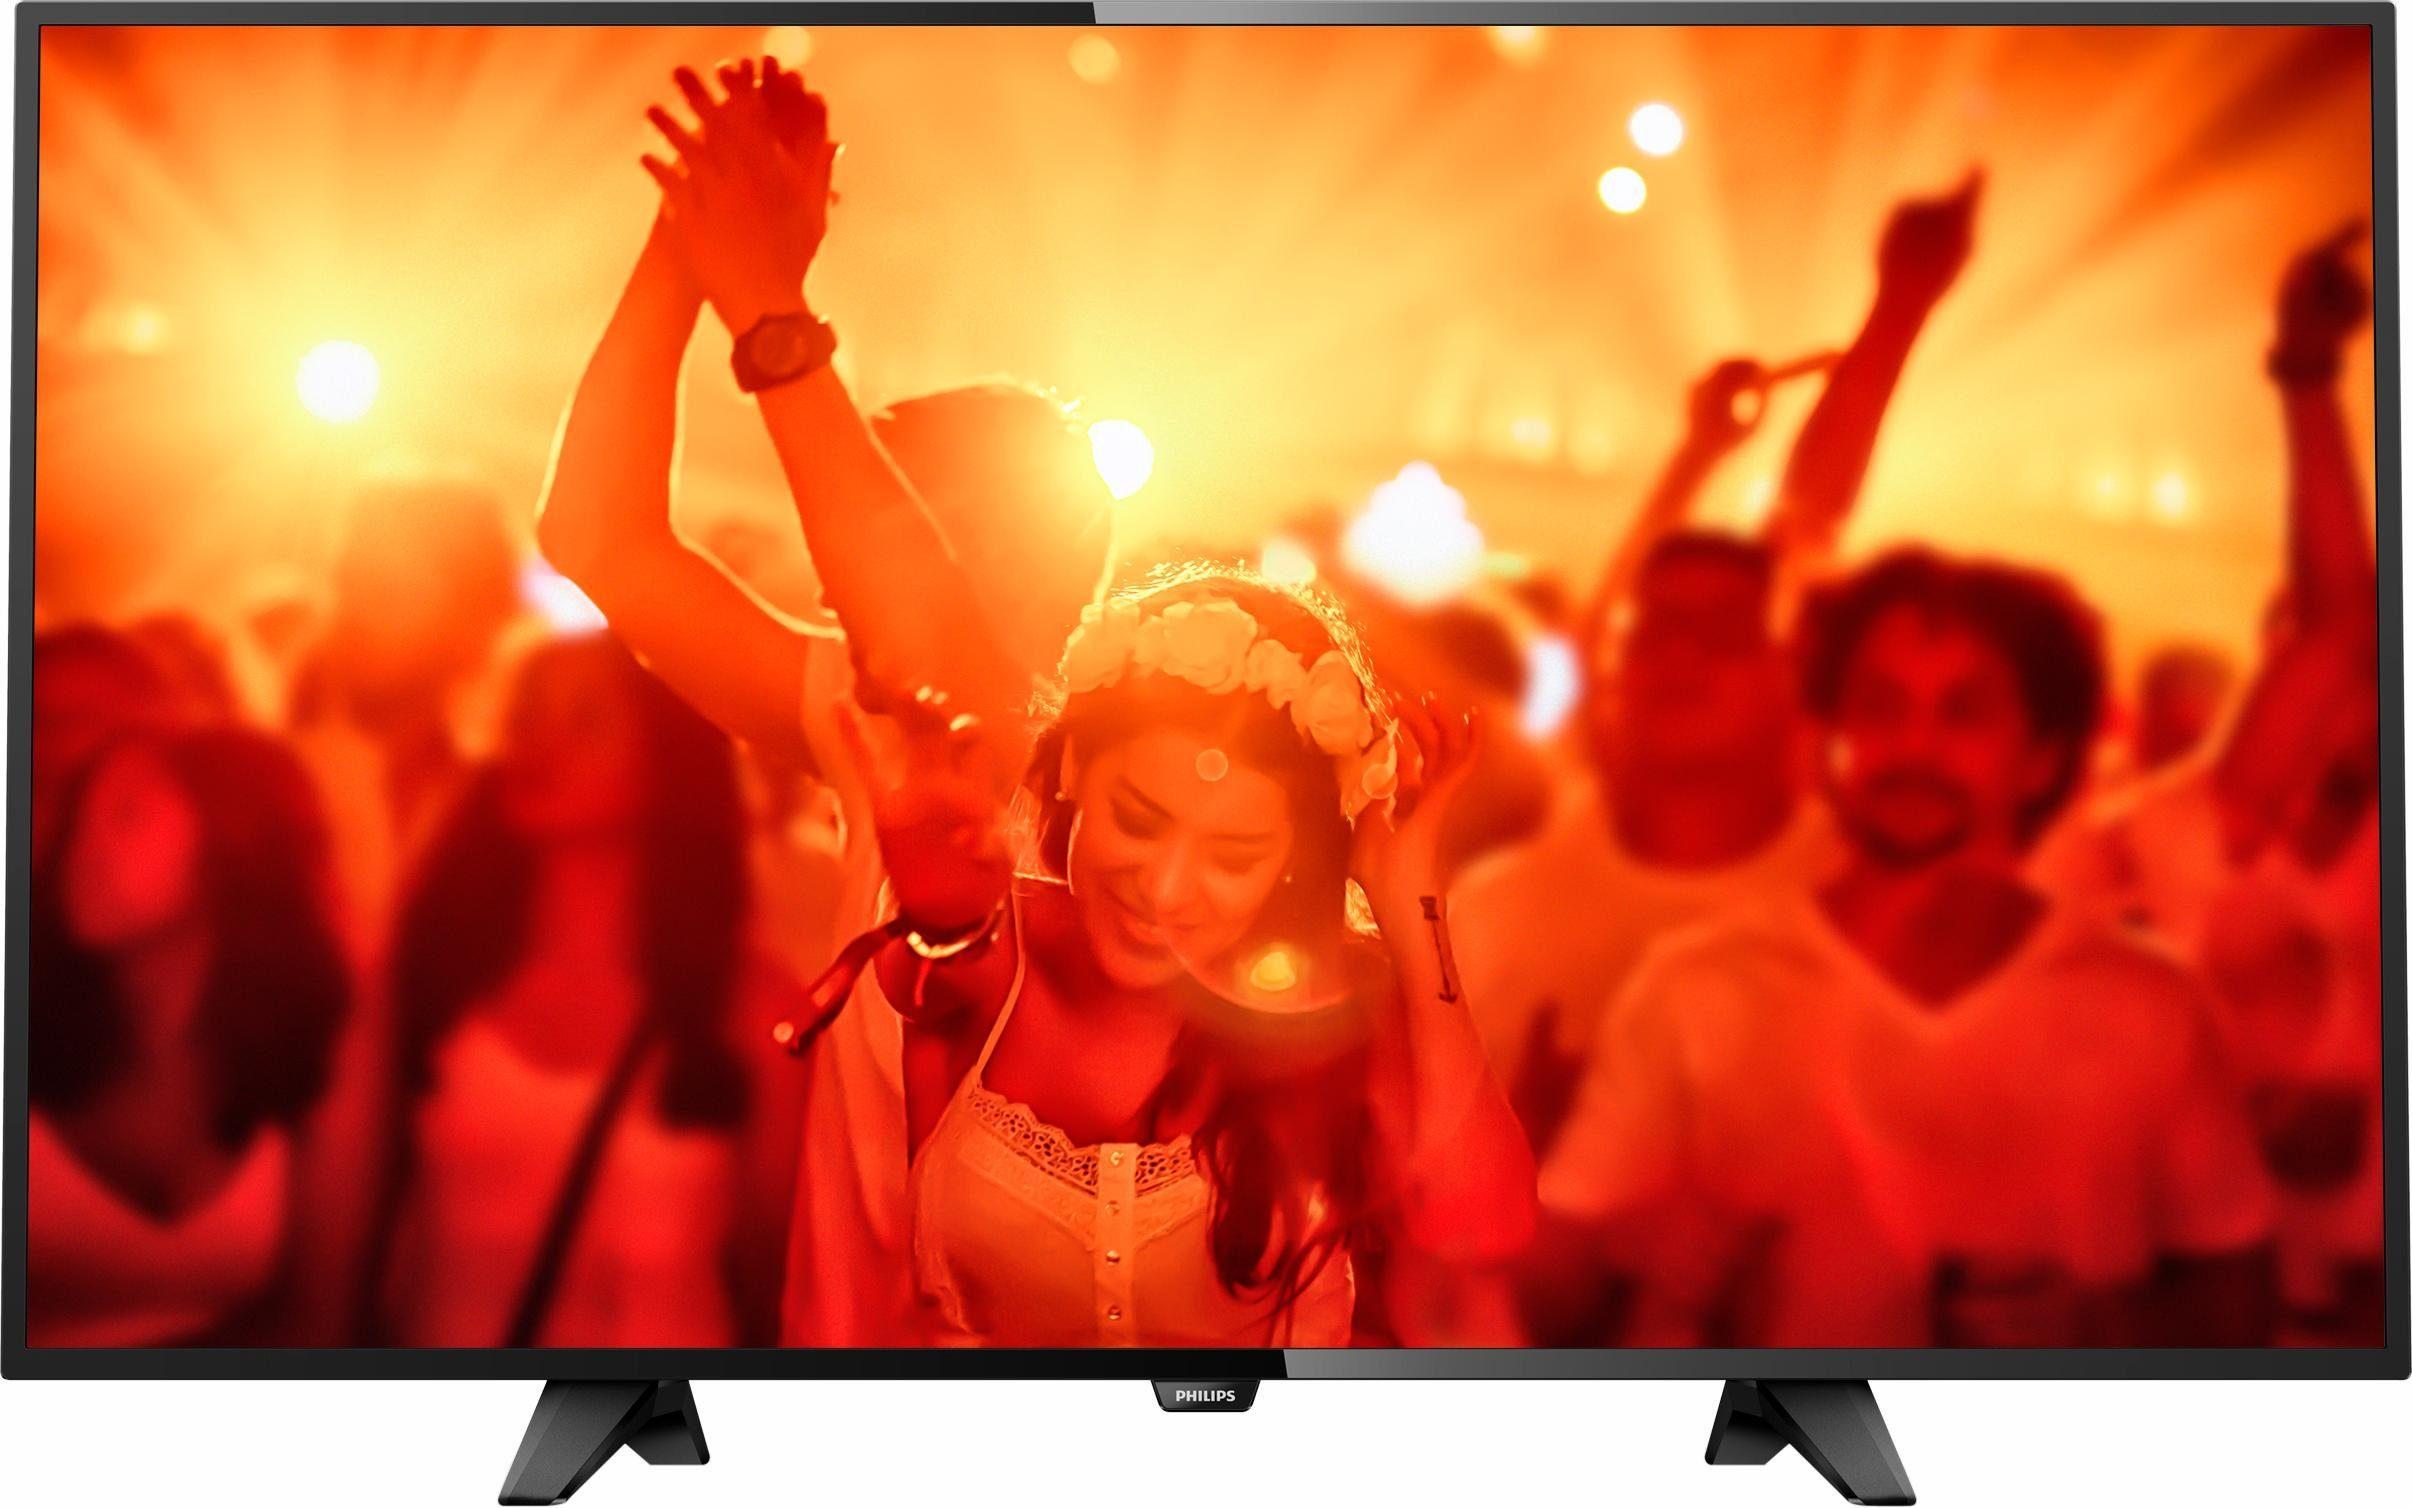 Philips 32PFS4131, LED Fernseher, 80 cm (32 Zoll), 1080p (Full HD)